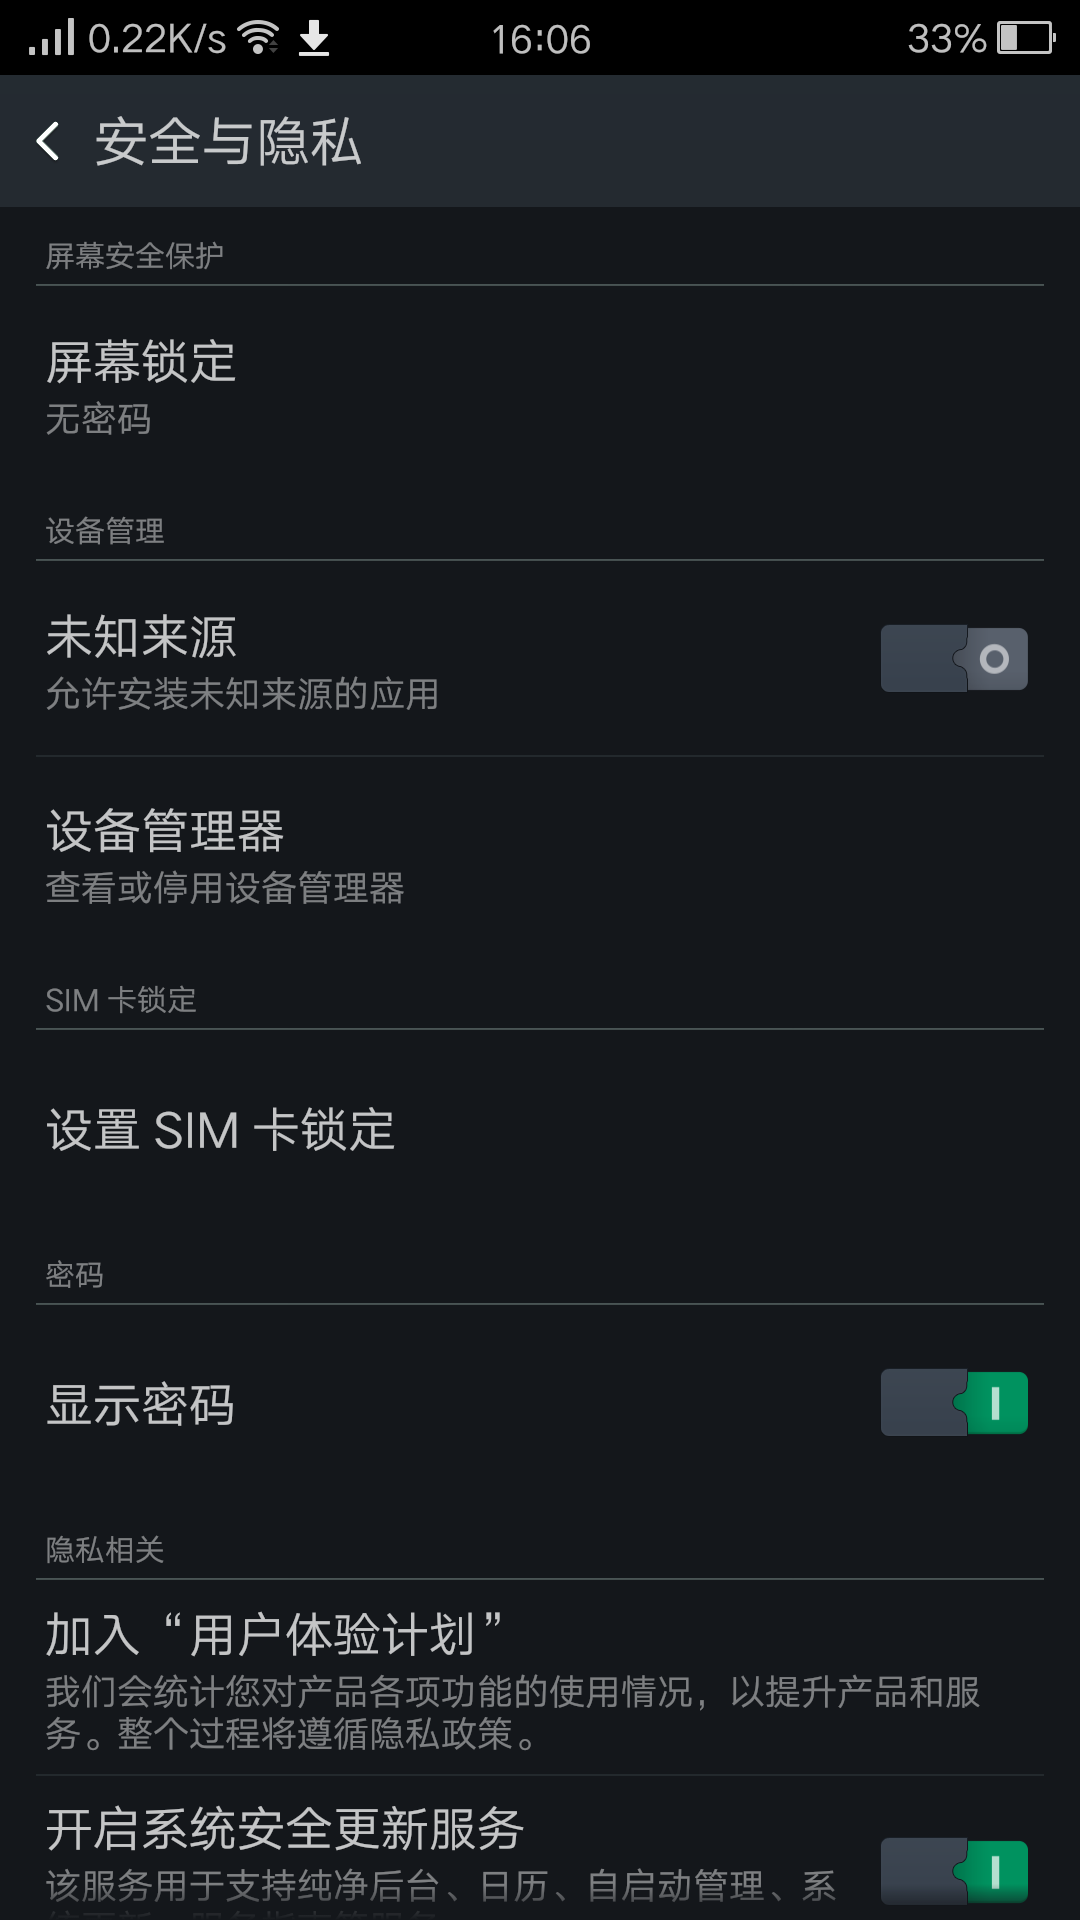 oppo手機鎖屏壁紙可以換成數字密碼鎖屏嗎